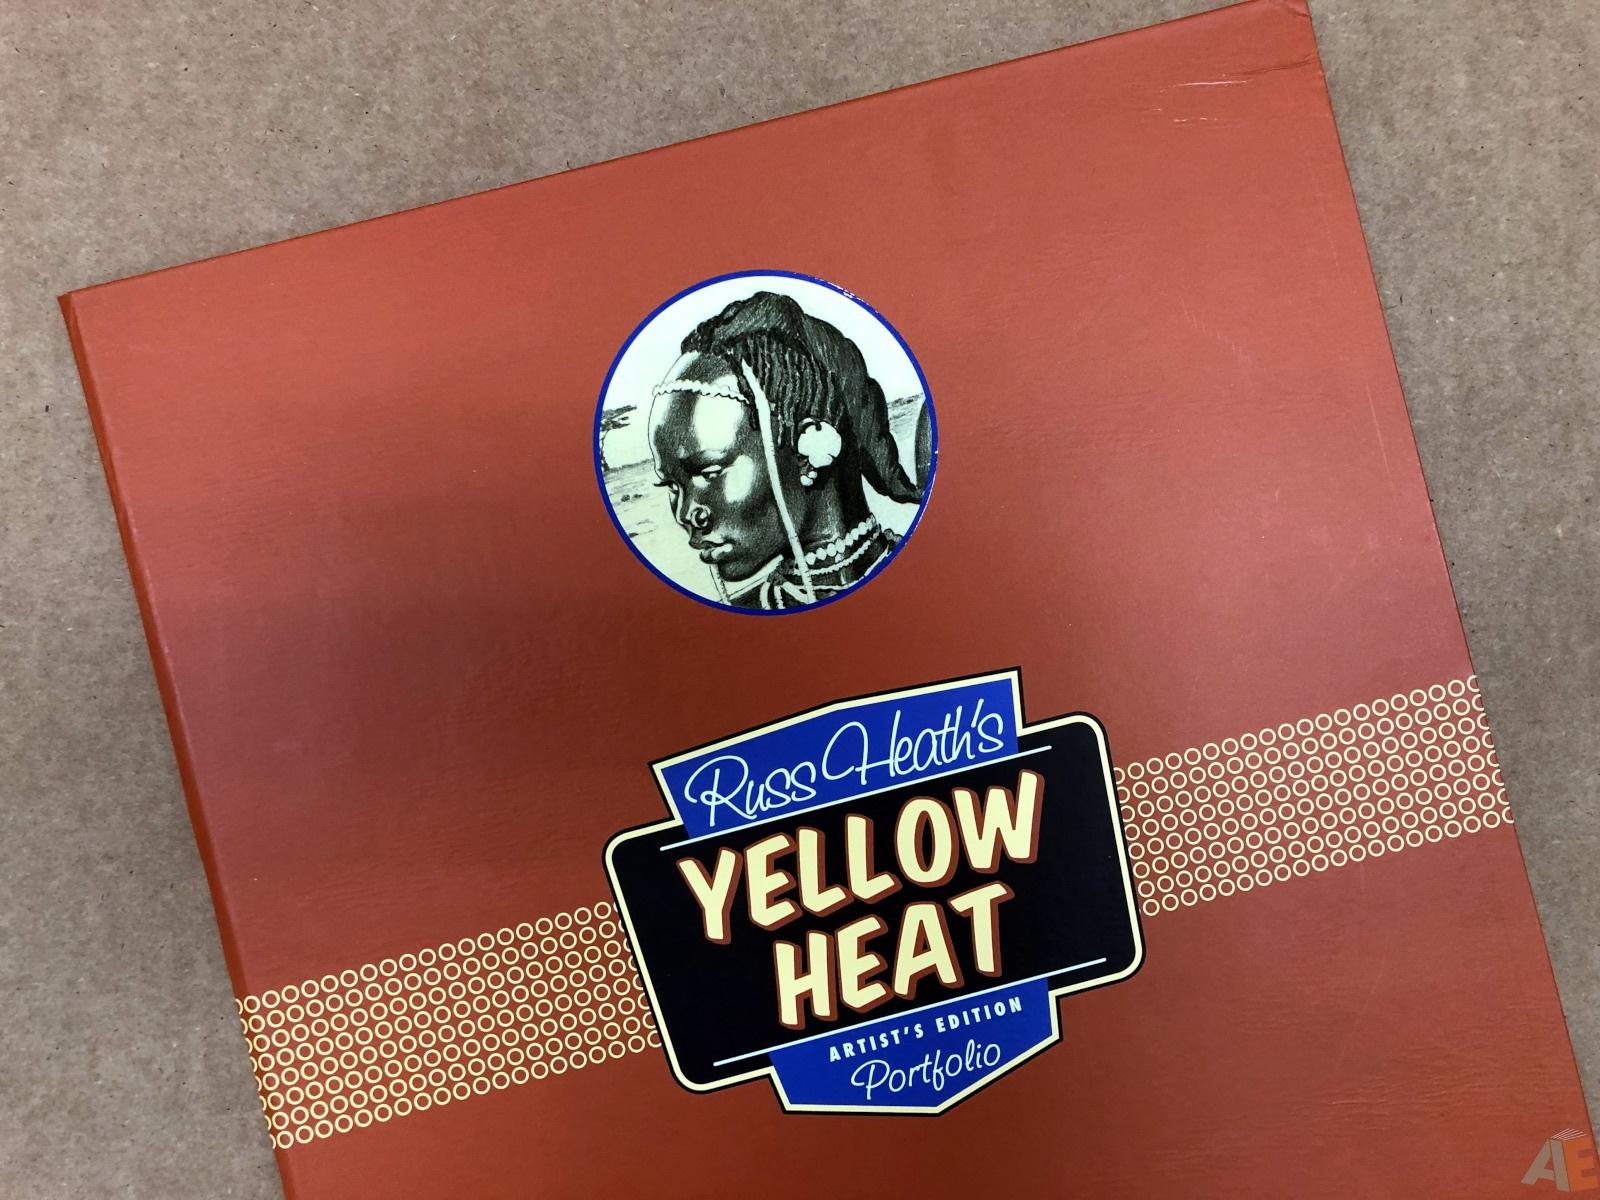 Russ Heath's Yellow Heat Artist's Edition Portfolio 14